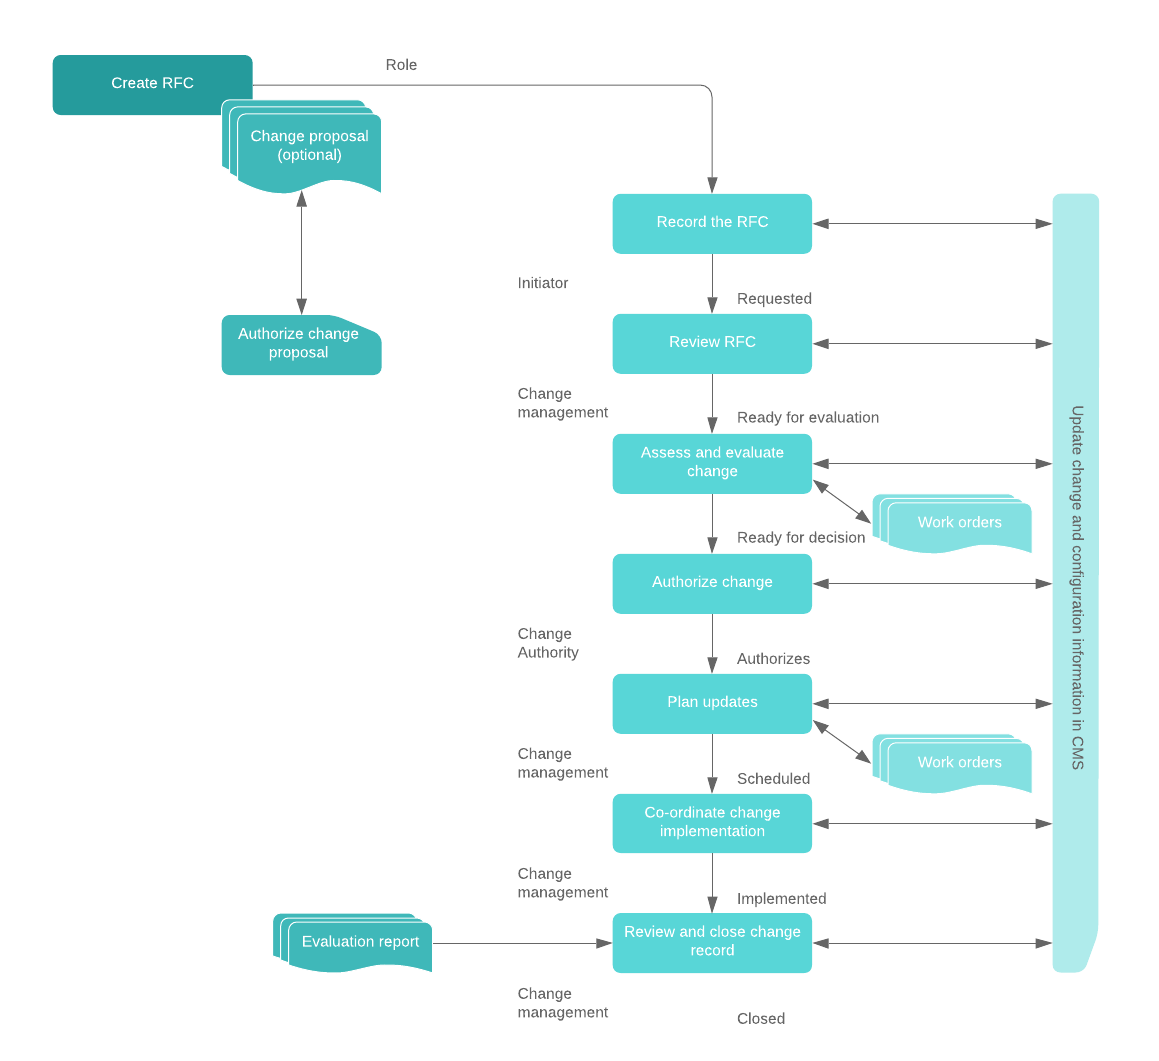 change management high-level process flow